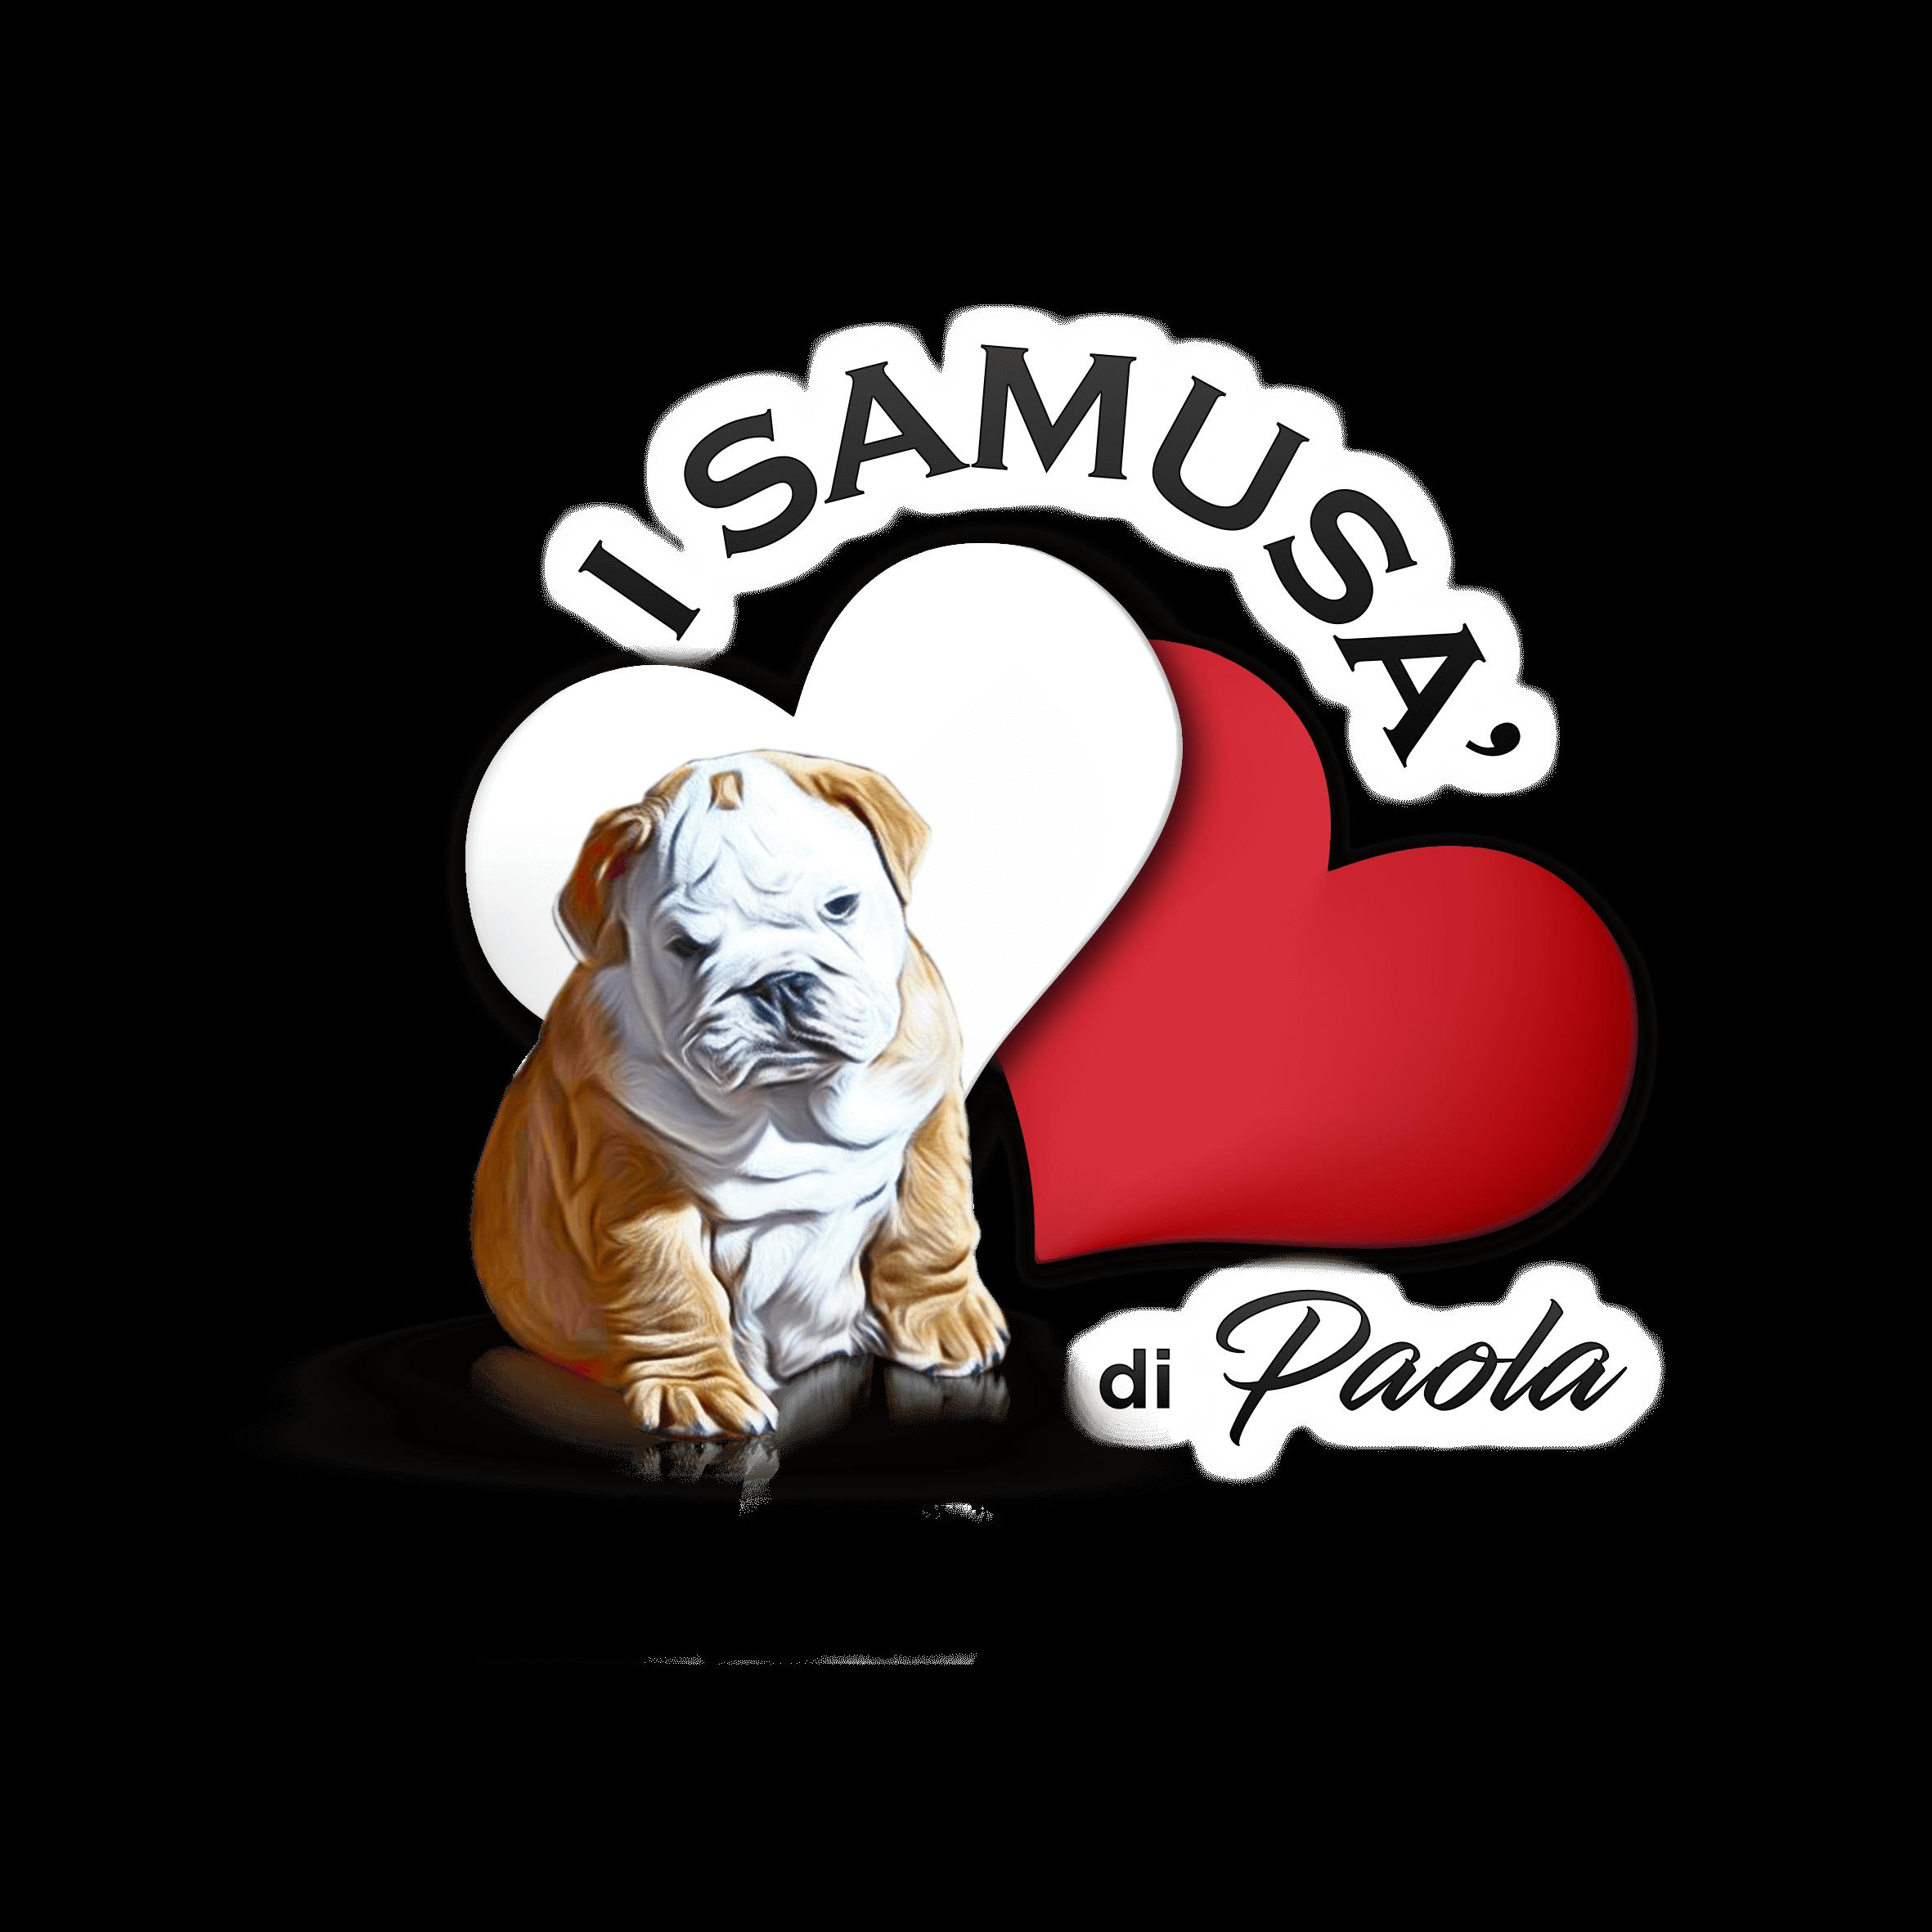 I SAMUSA' DI PAOLA